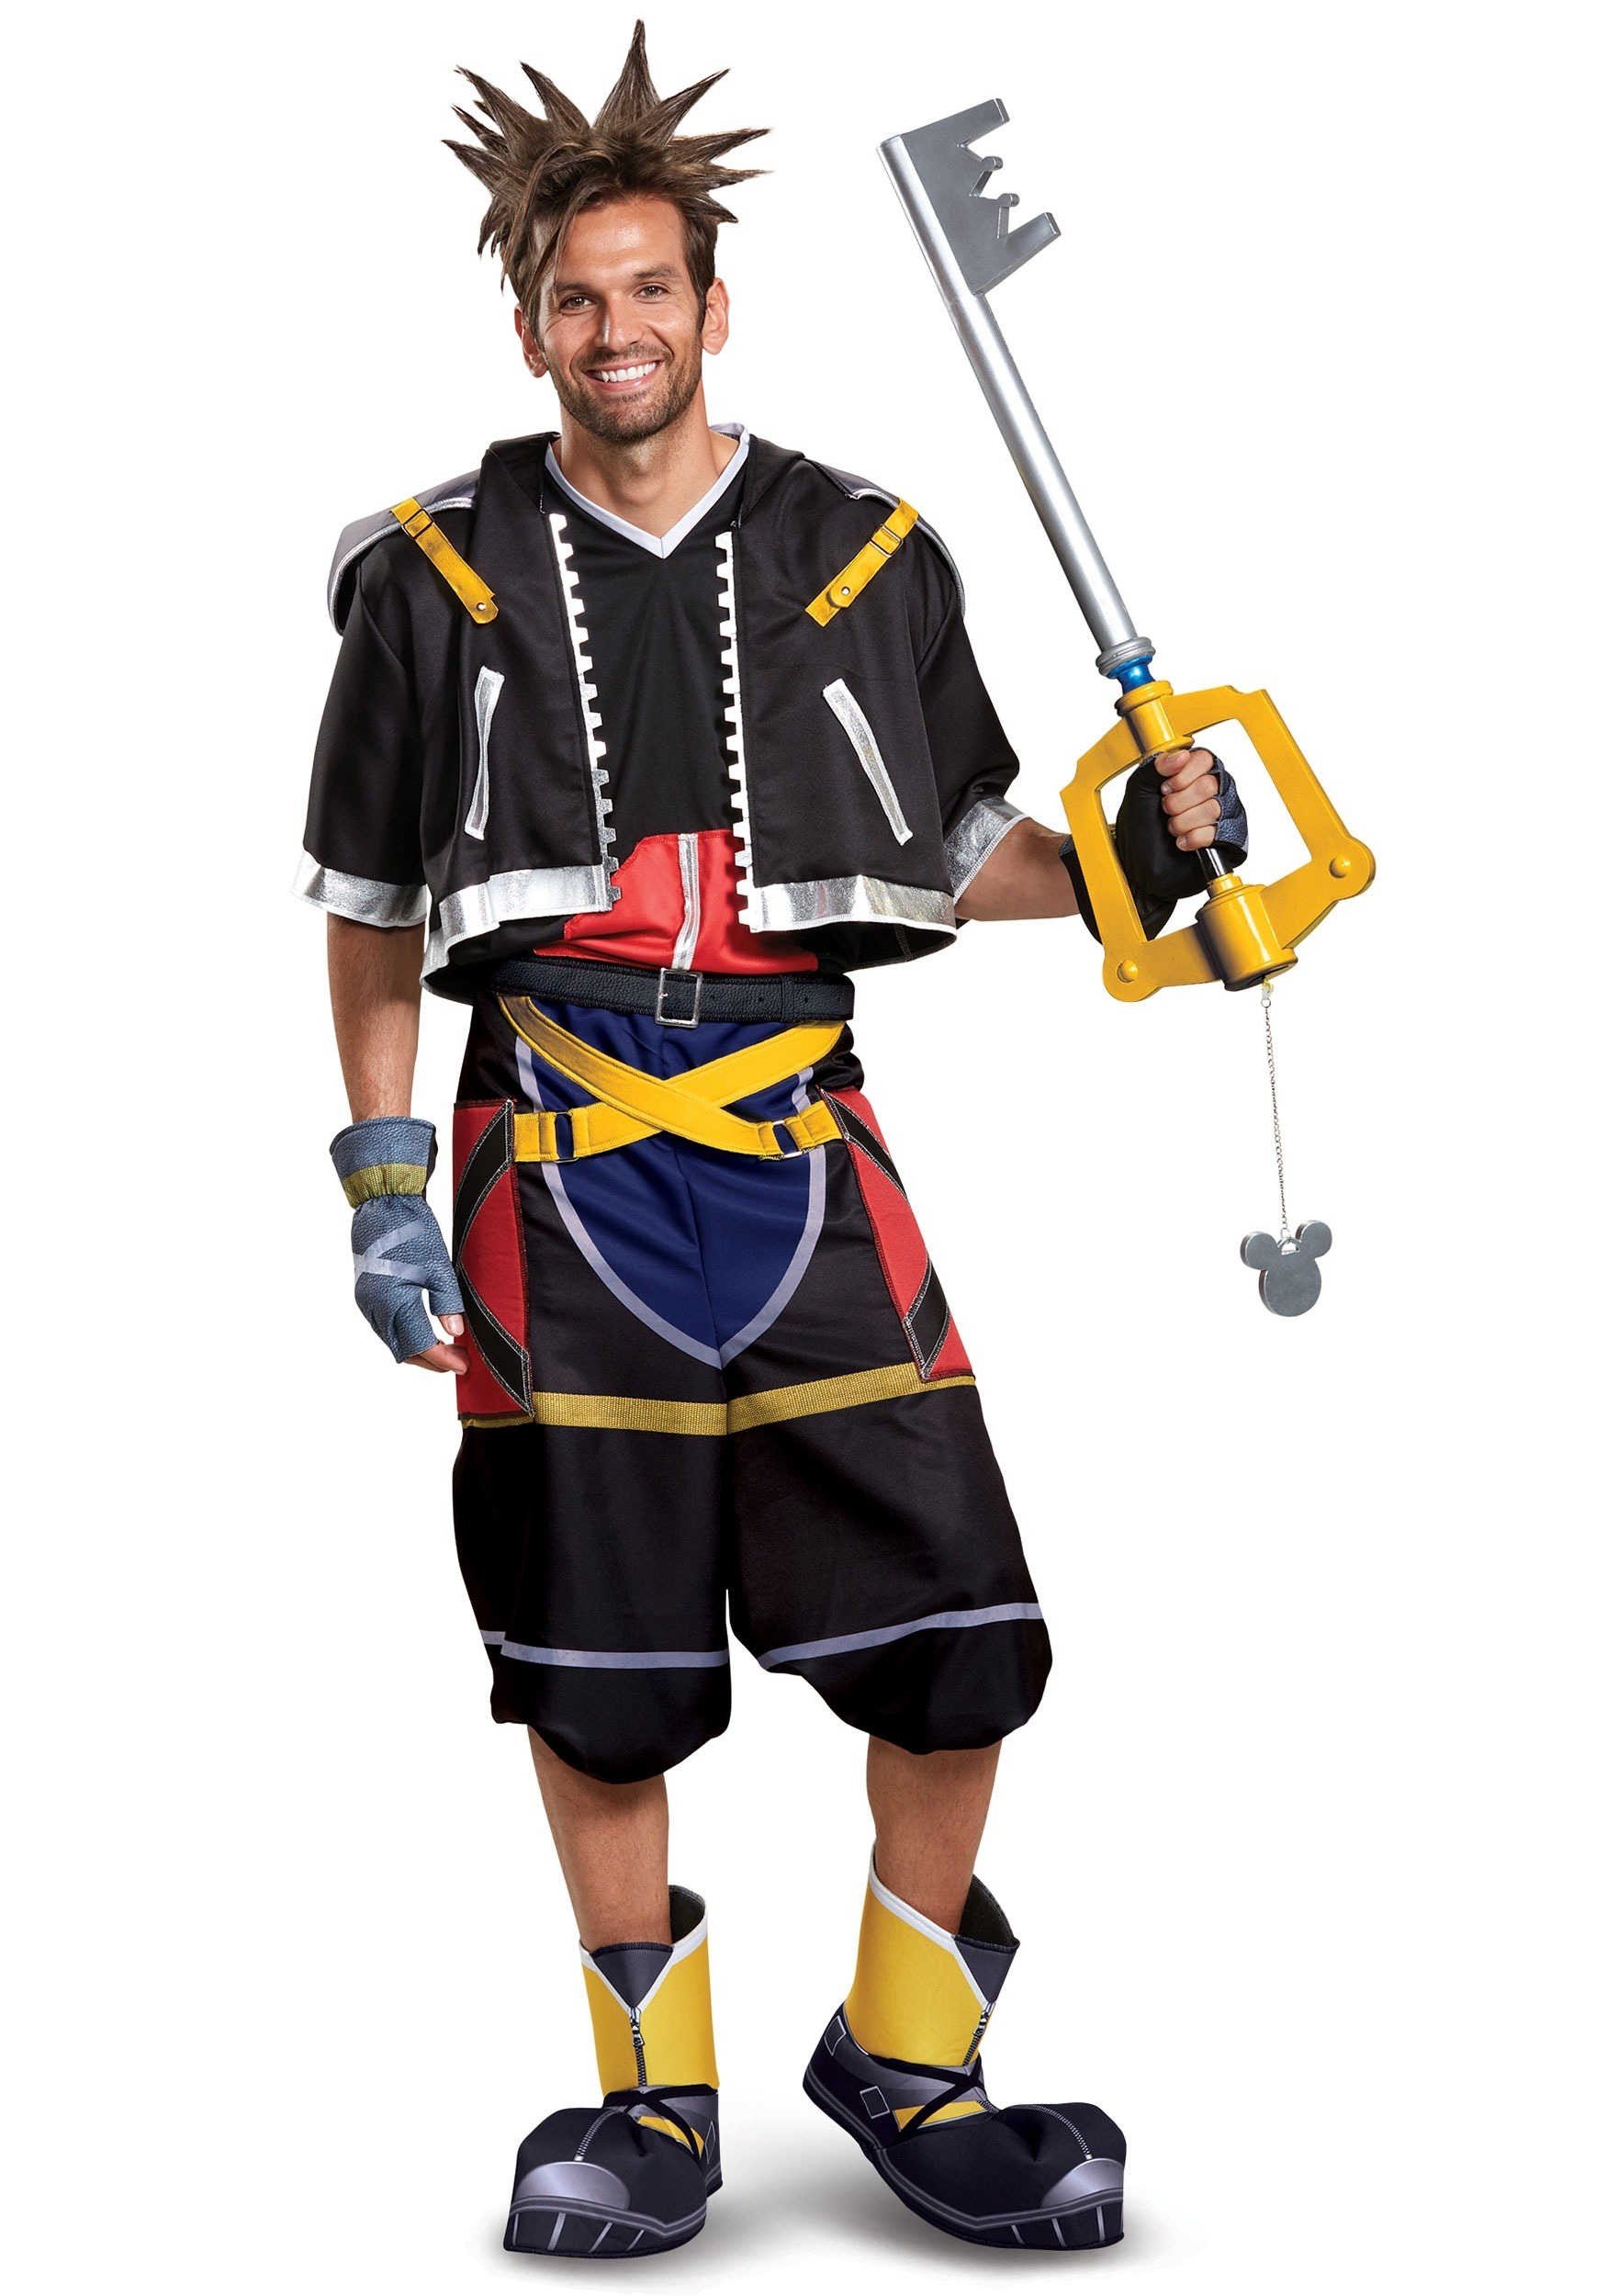 Kingdom Hearts Sora Halloween Town Costume.Deluxe Disney Kingdom Hearts Sora Men S Costume